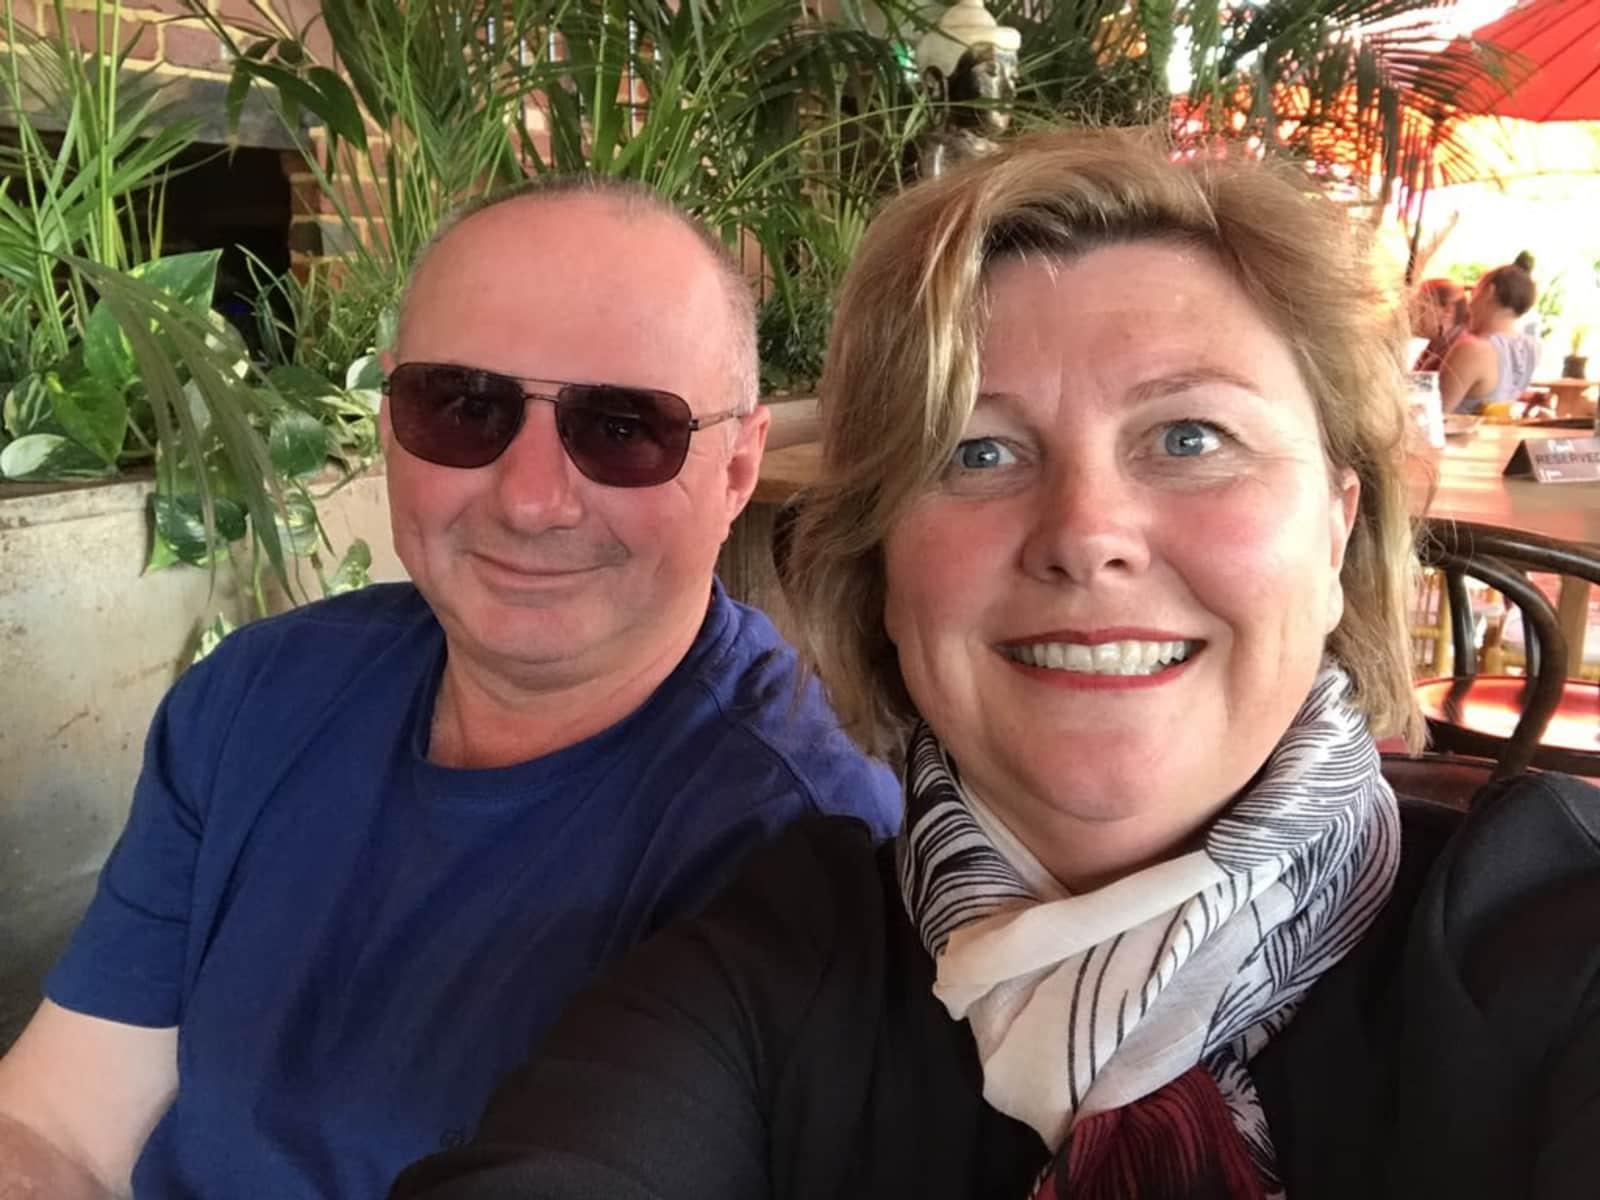 Elizabeth & Brendan from Perth, Western Australia, Australia